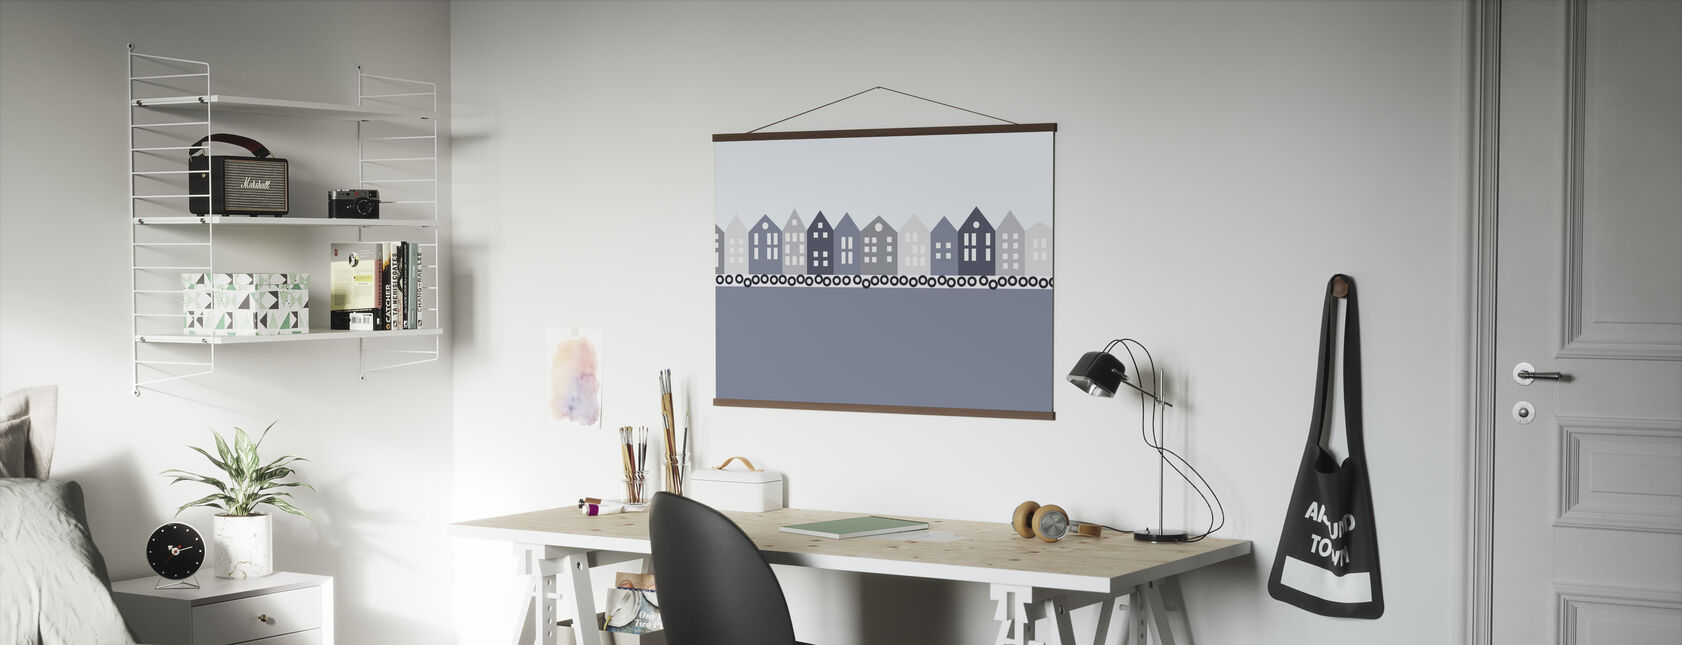 Bryggen - Blue - Poster - Office